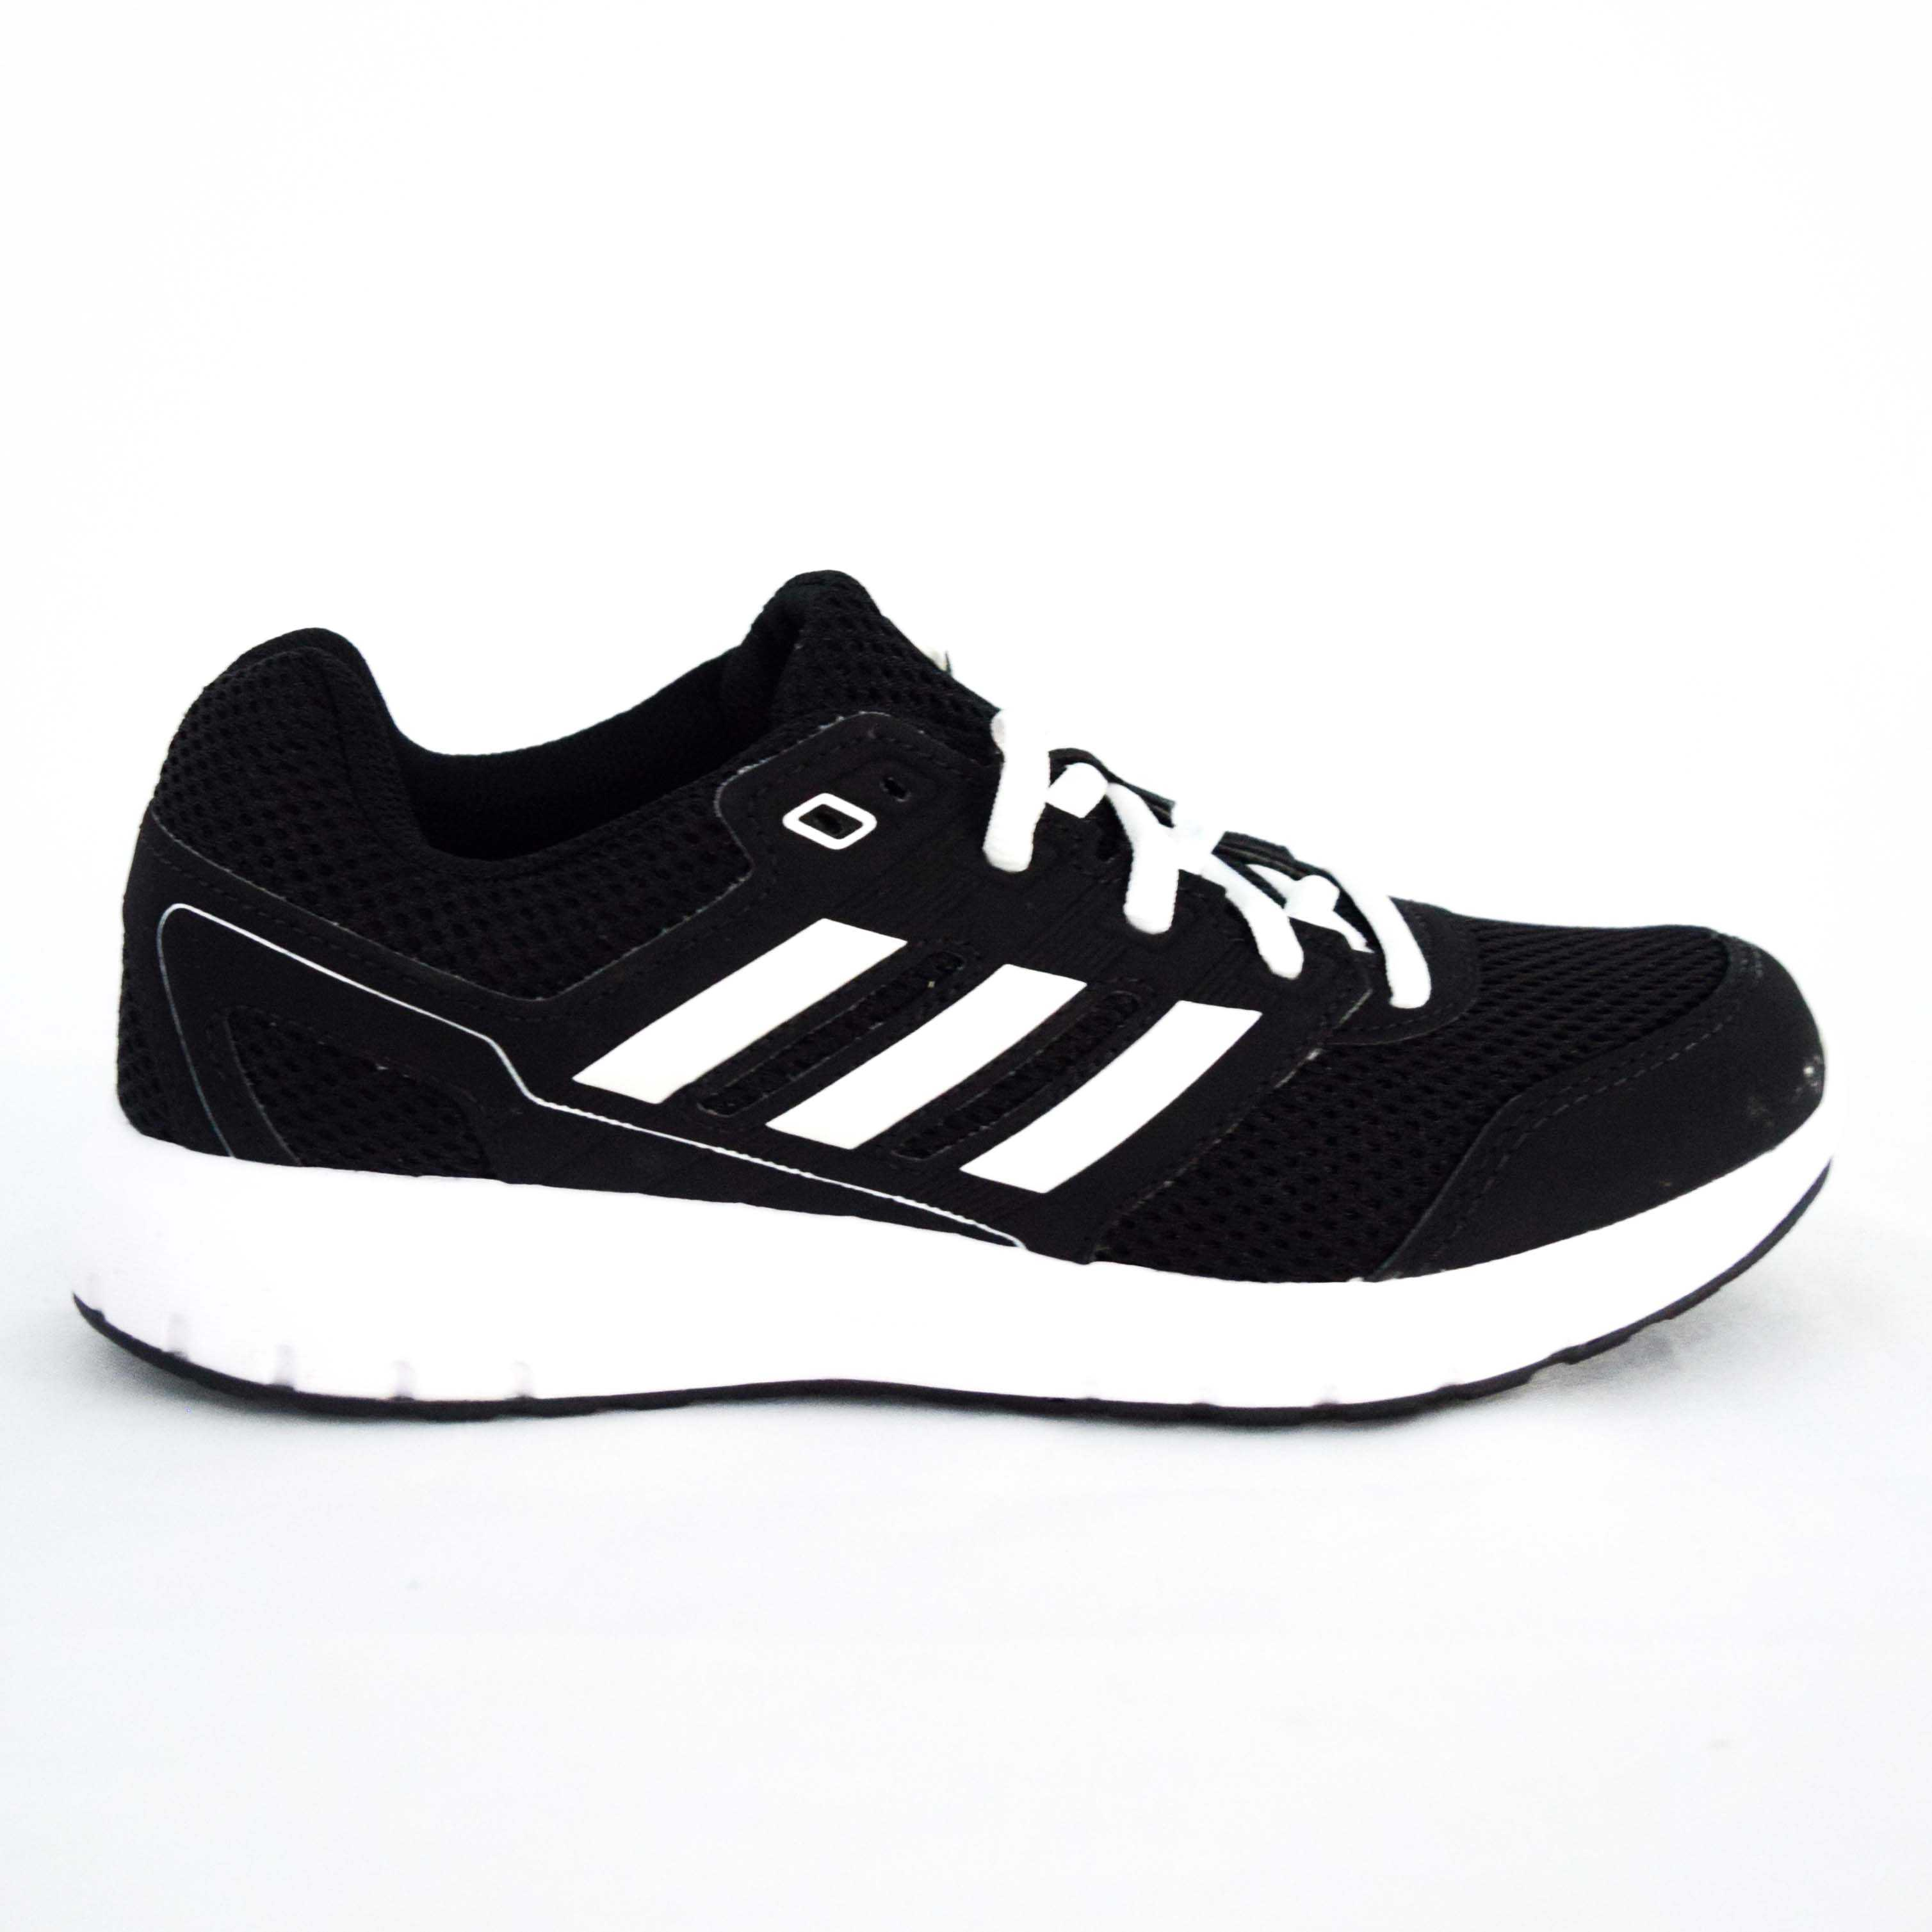 fe5618925 Tênis Adidas Duramo Lite 2.0 Preto